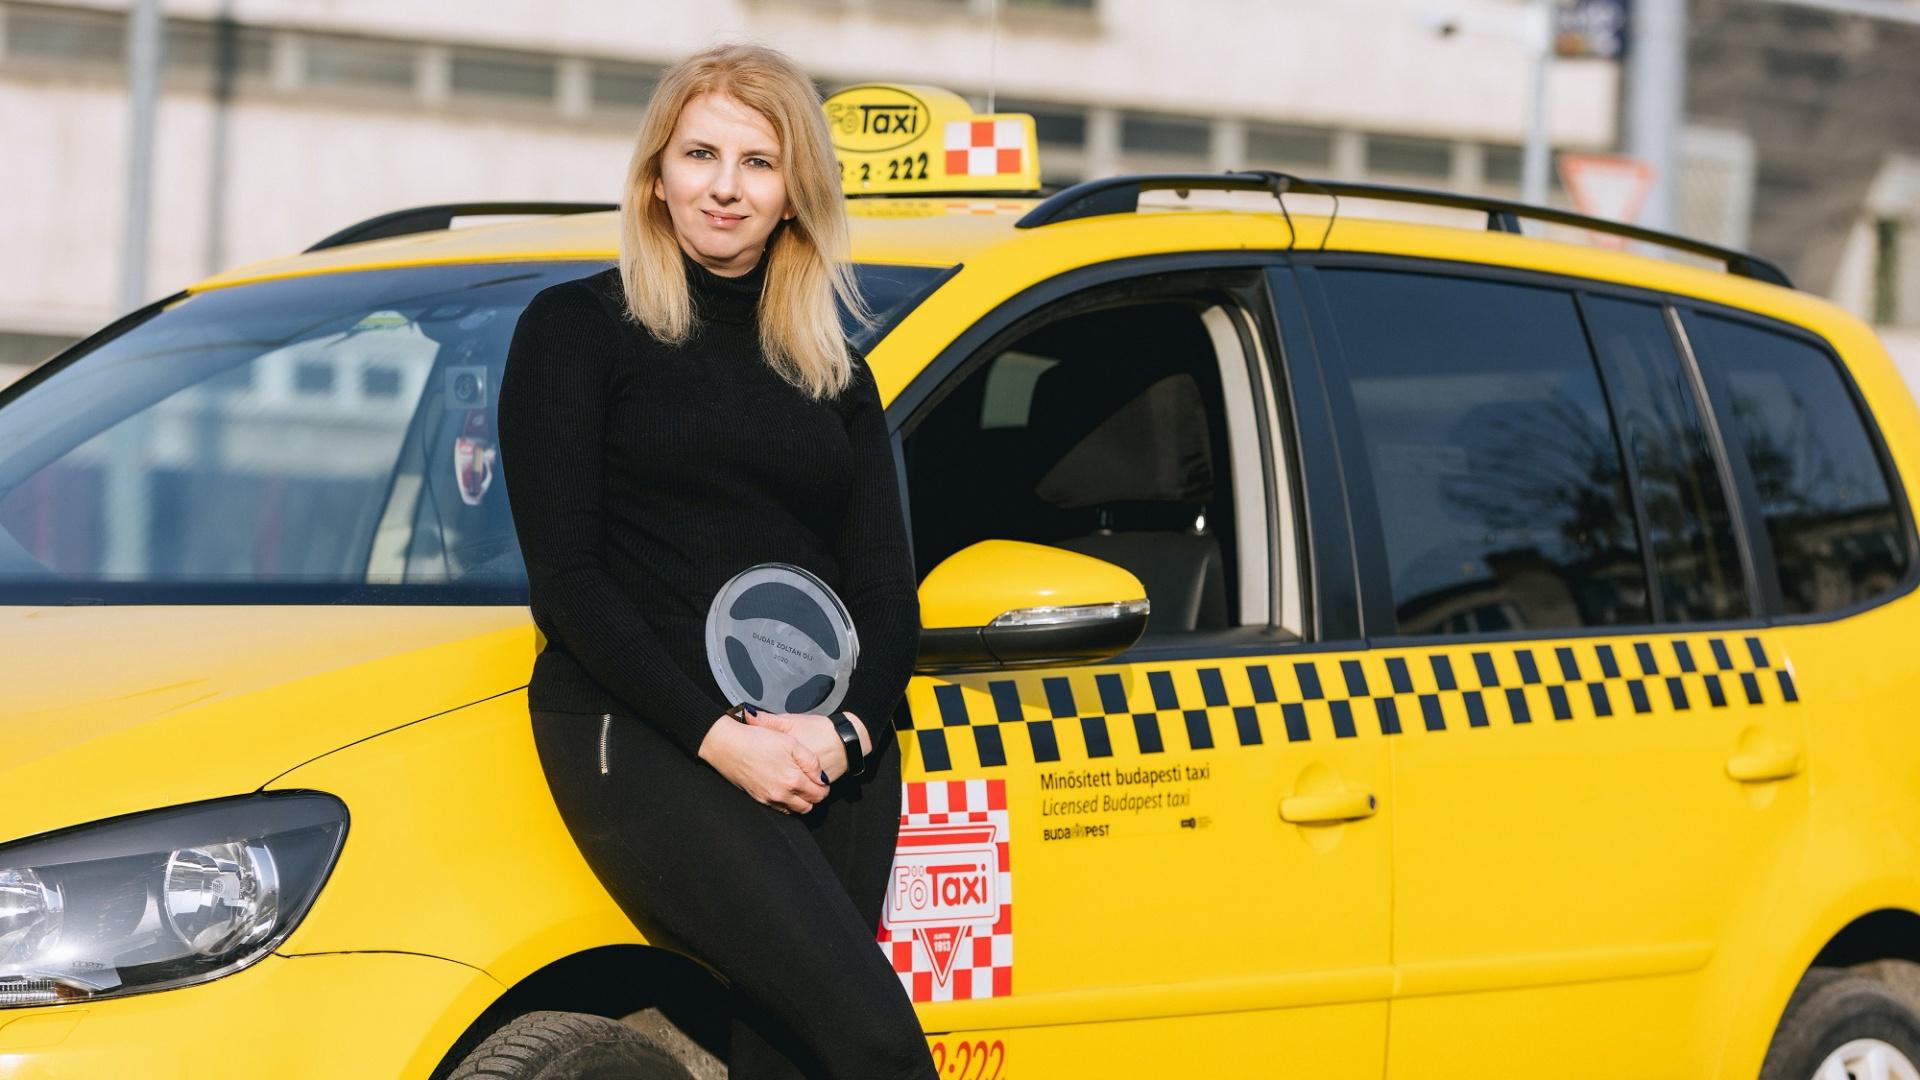 Zsuzsanna, Az Év Taxisofőrje